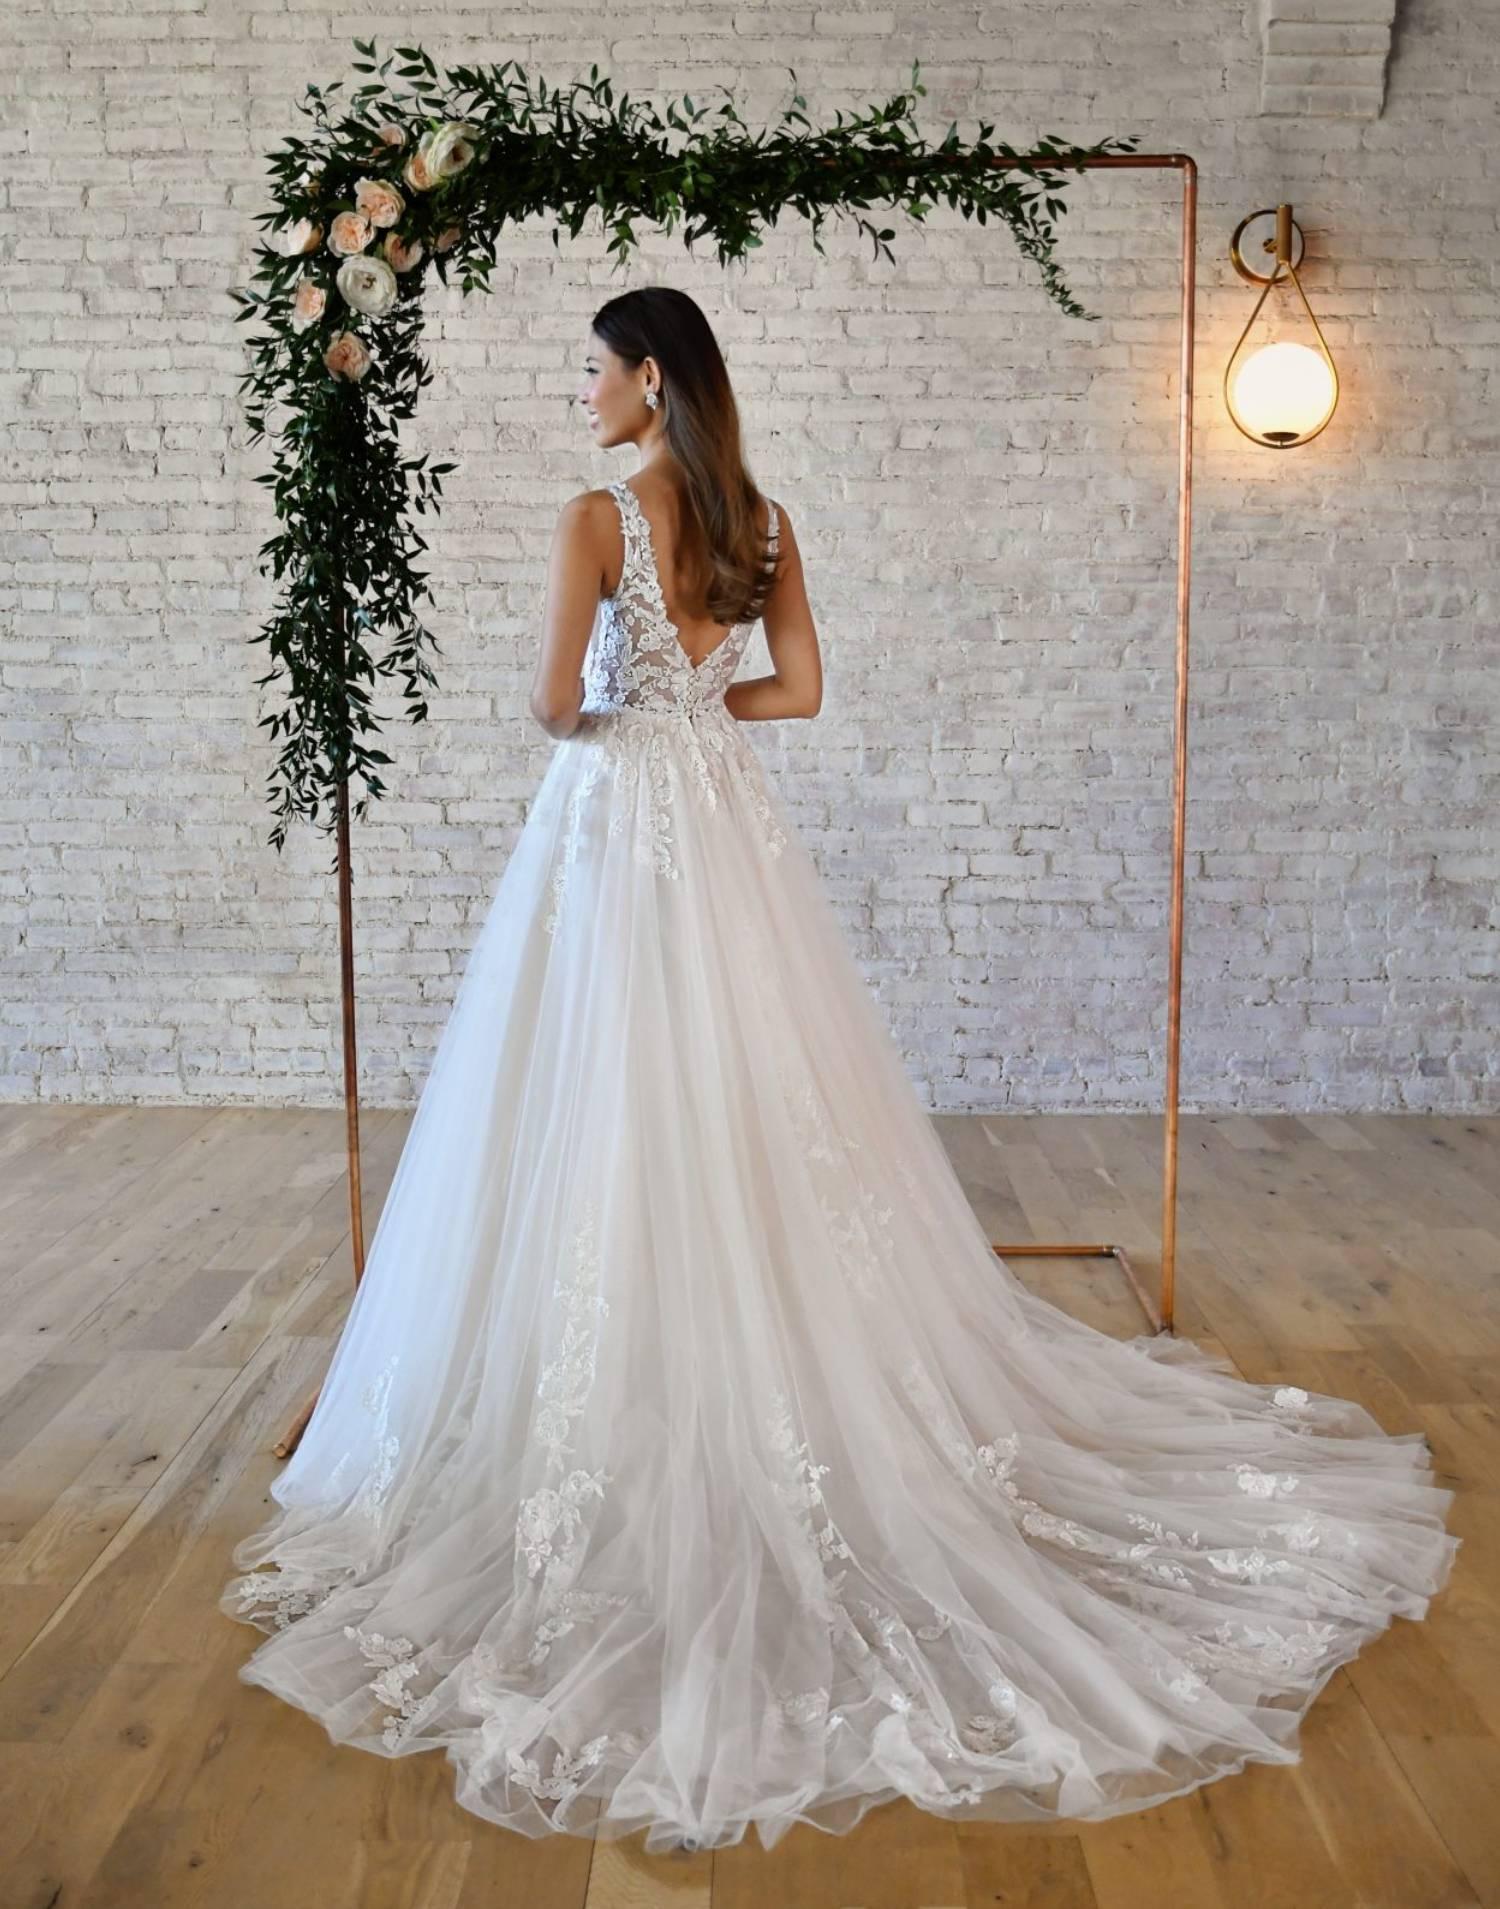 7194-wedding-dress-Stella-York-additional-view-min